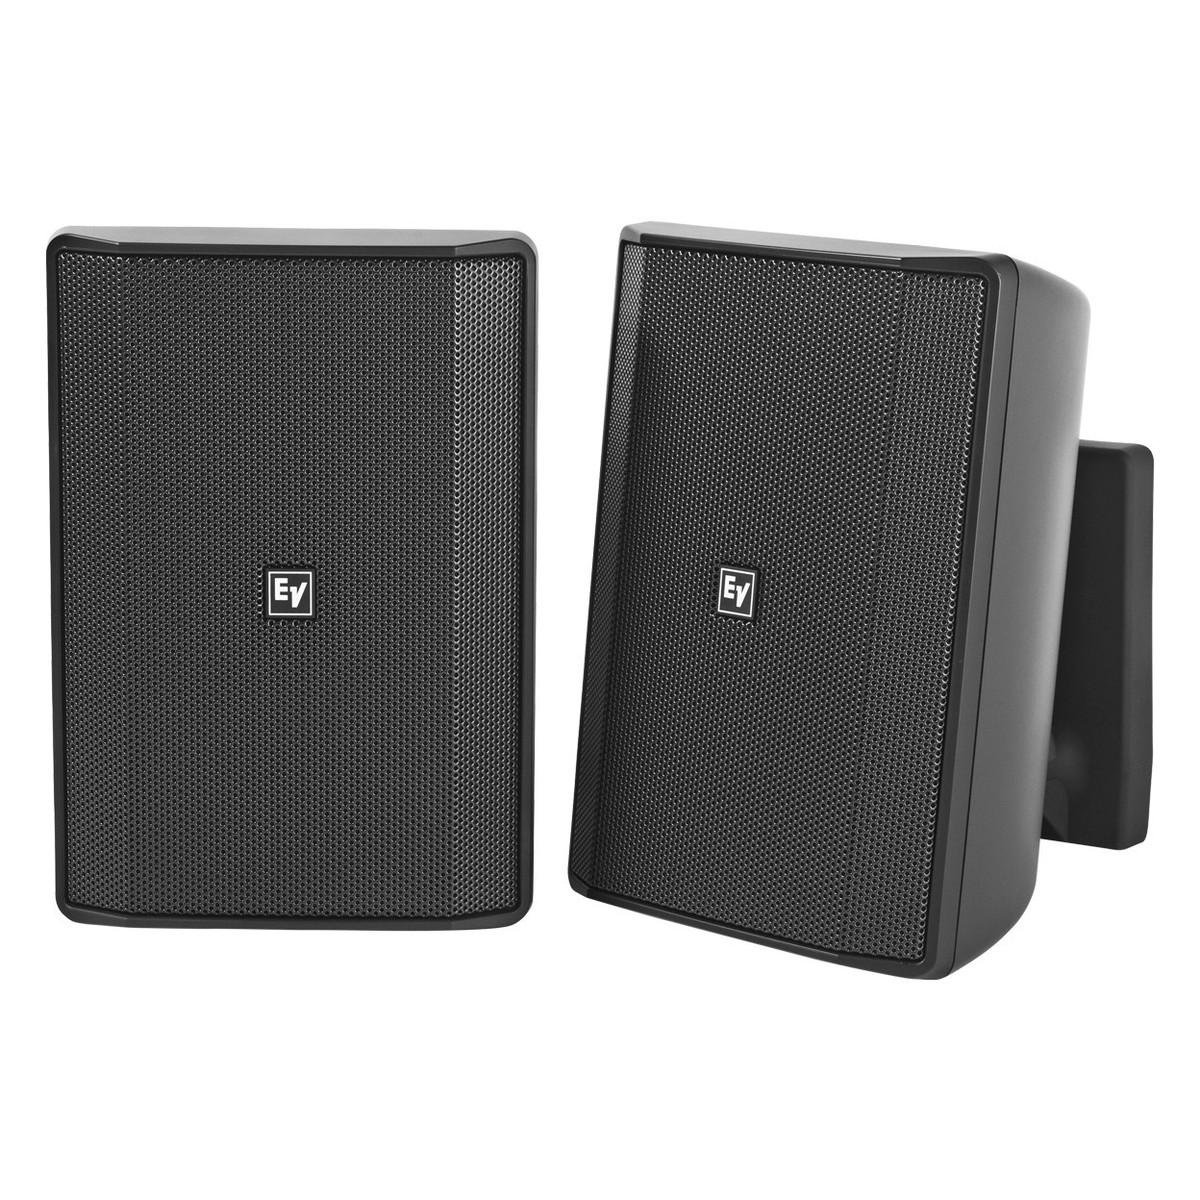 Electro Voice Evid S52 Installation Speakers Pair